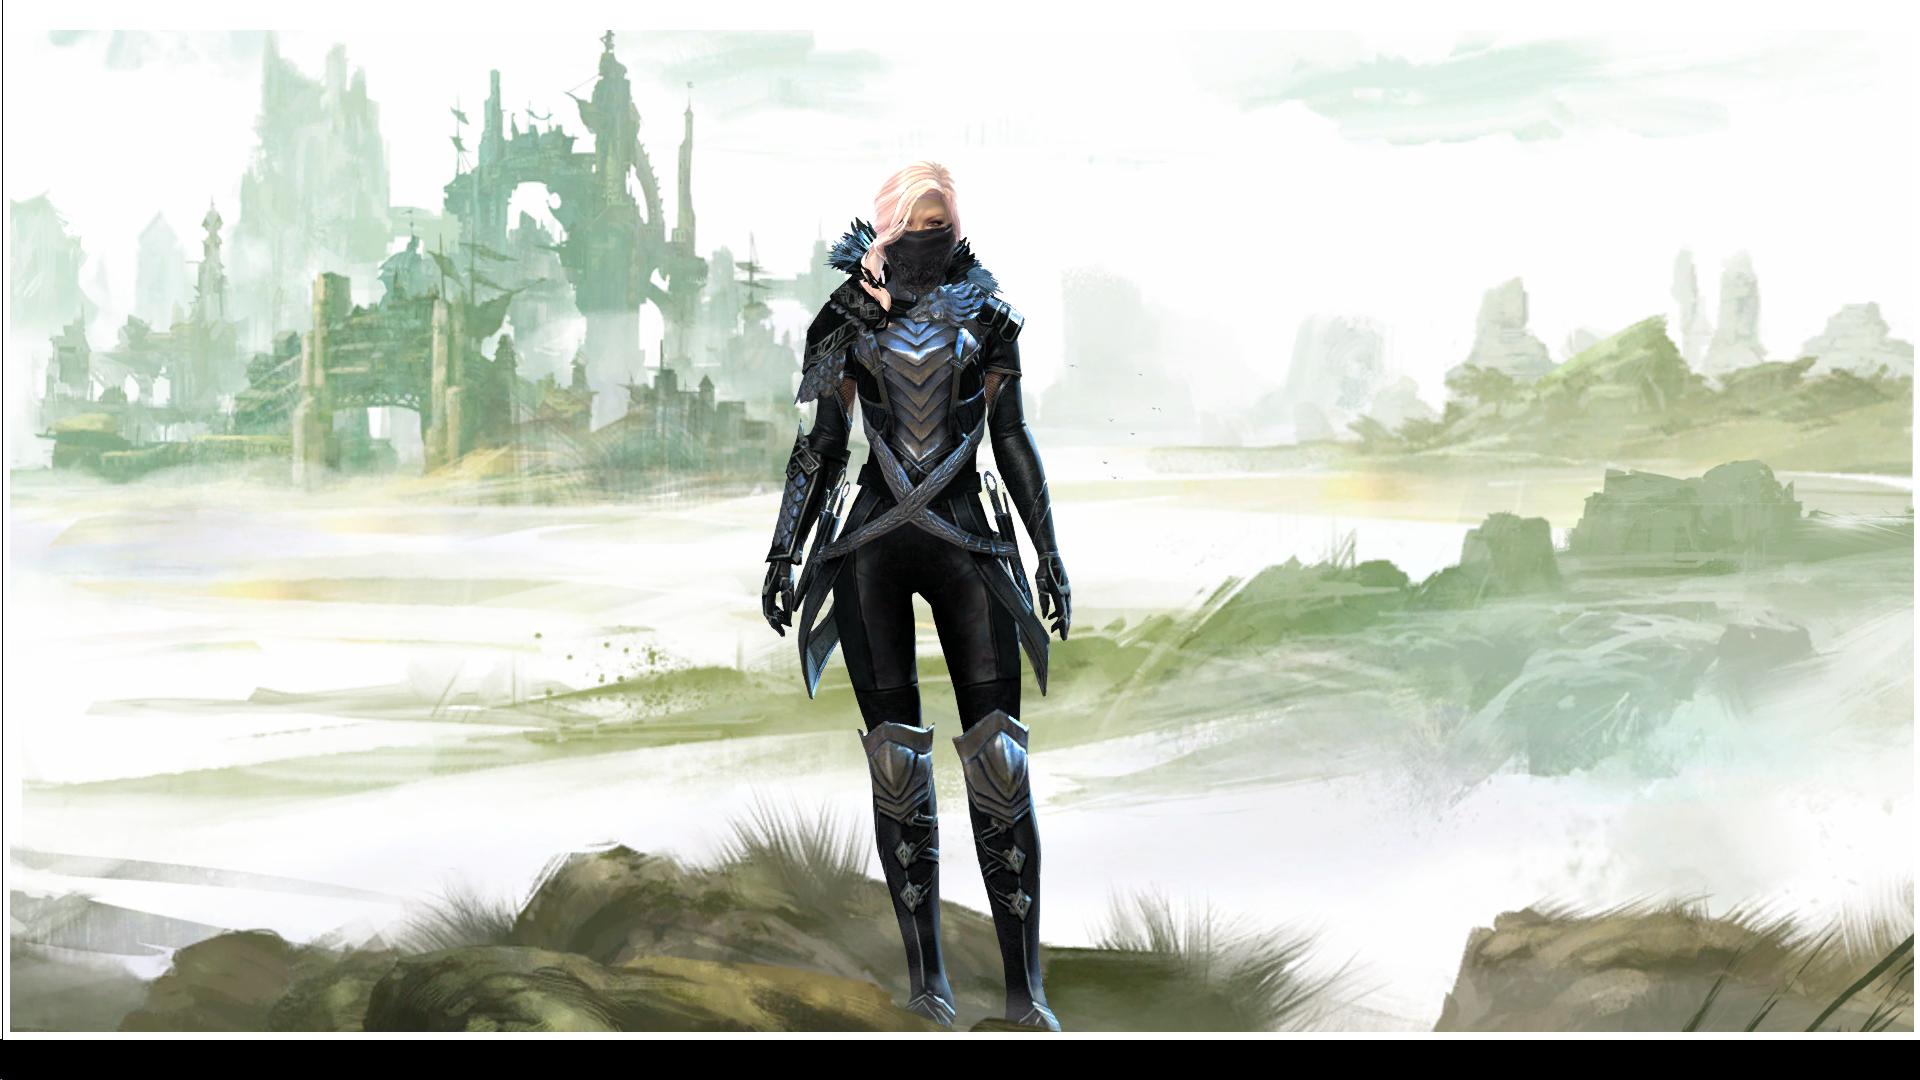 Best looking medium armor race? : Guildwars2 | Character